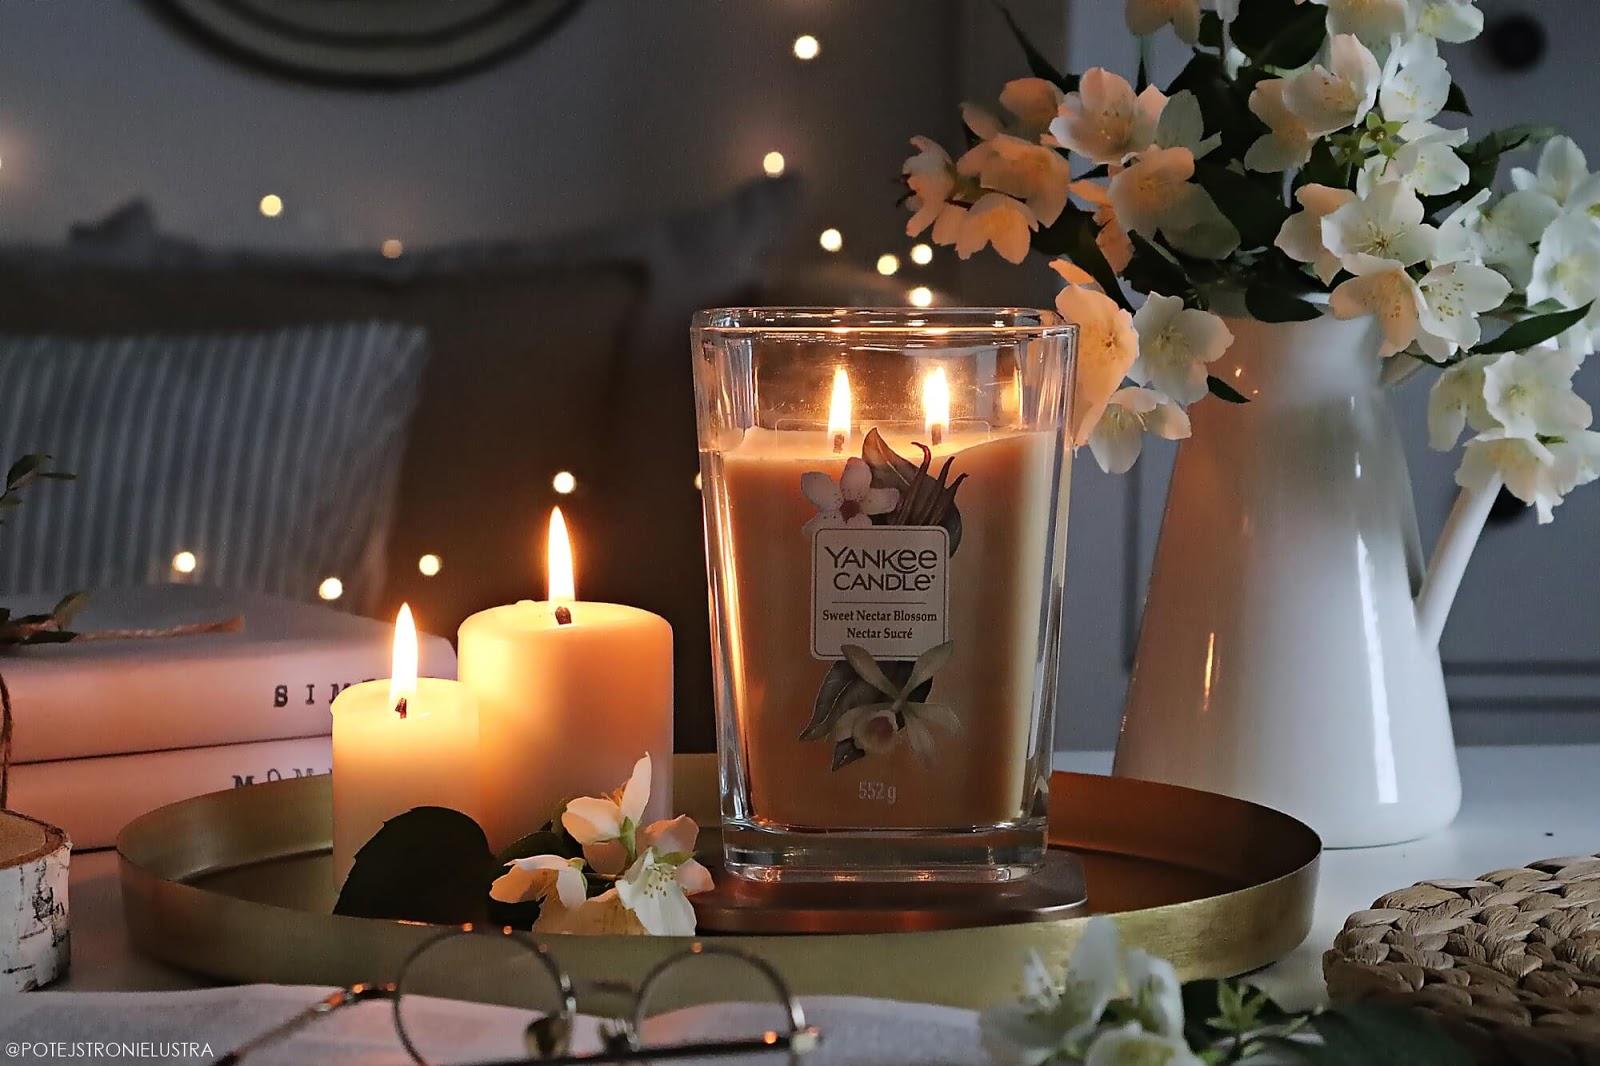 sweet nectar blossom yankee candle świeca zapachowa